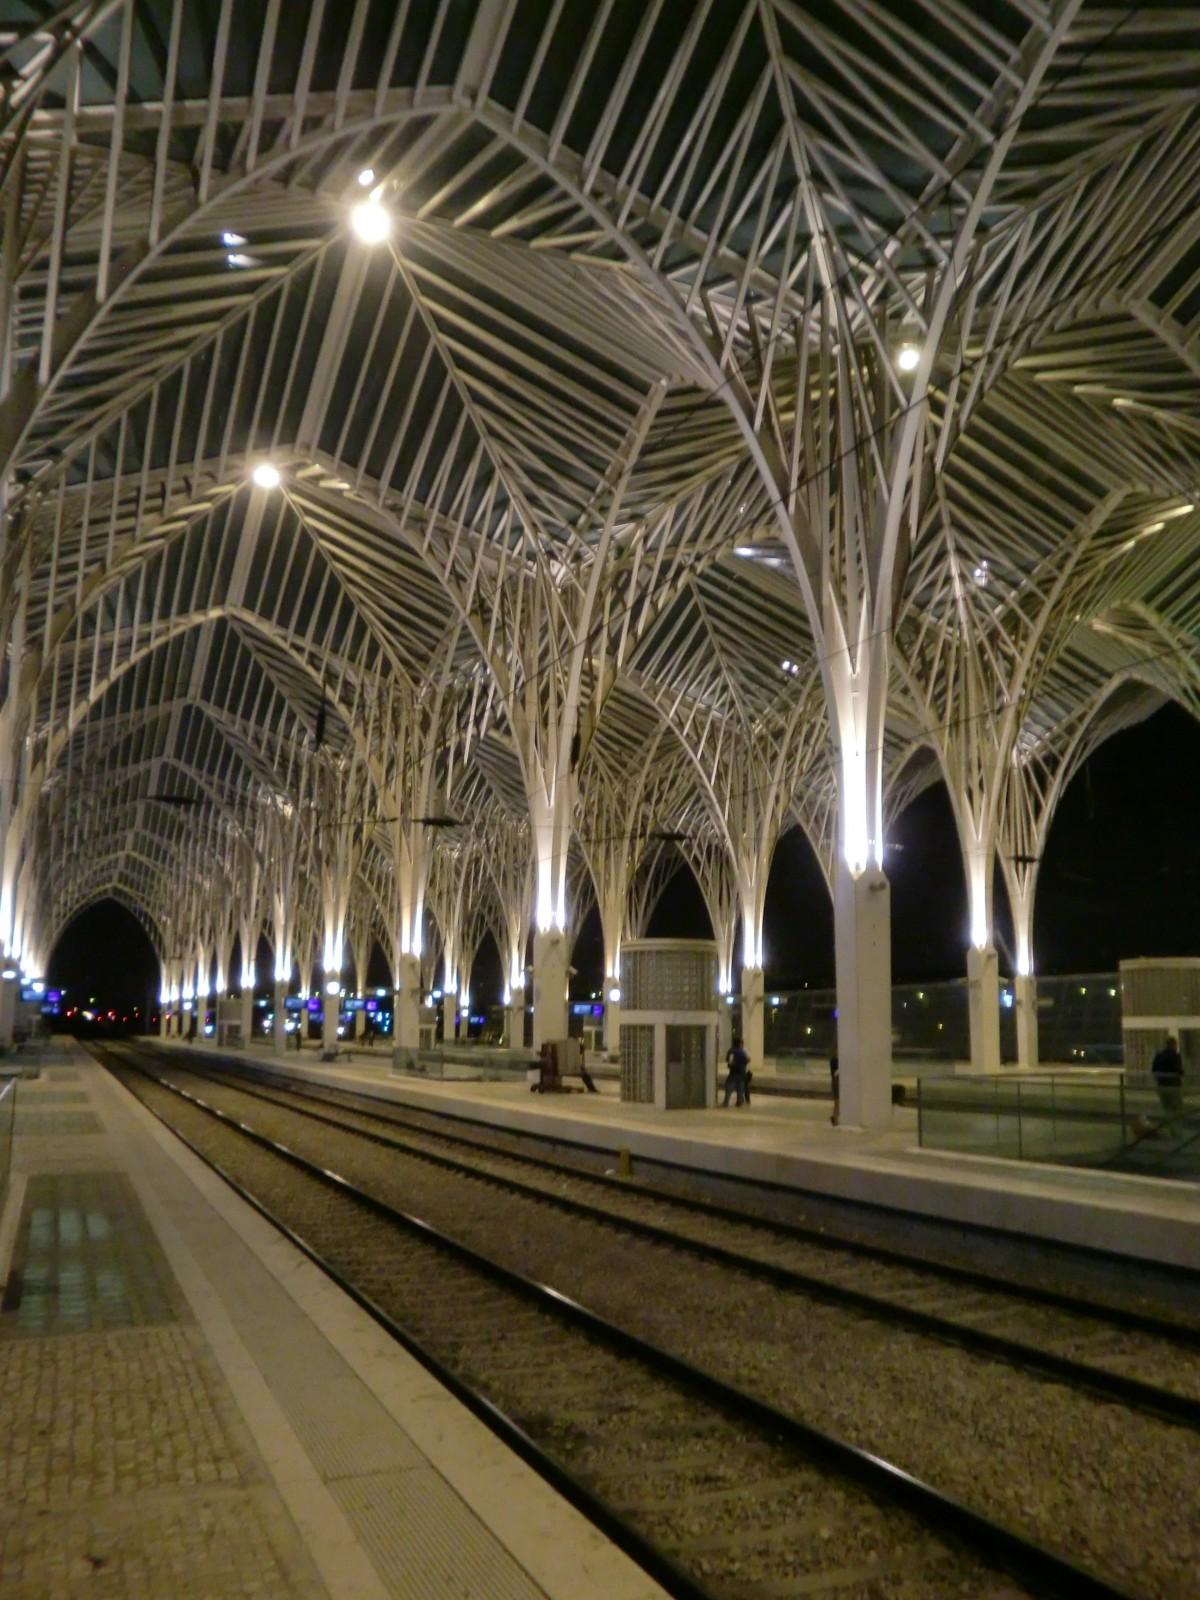 Free Images : light, architecture, night, lighting, public ...